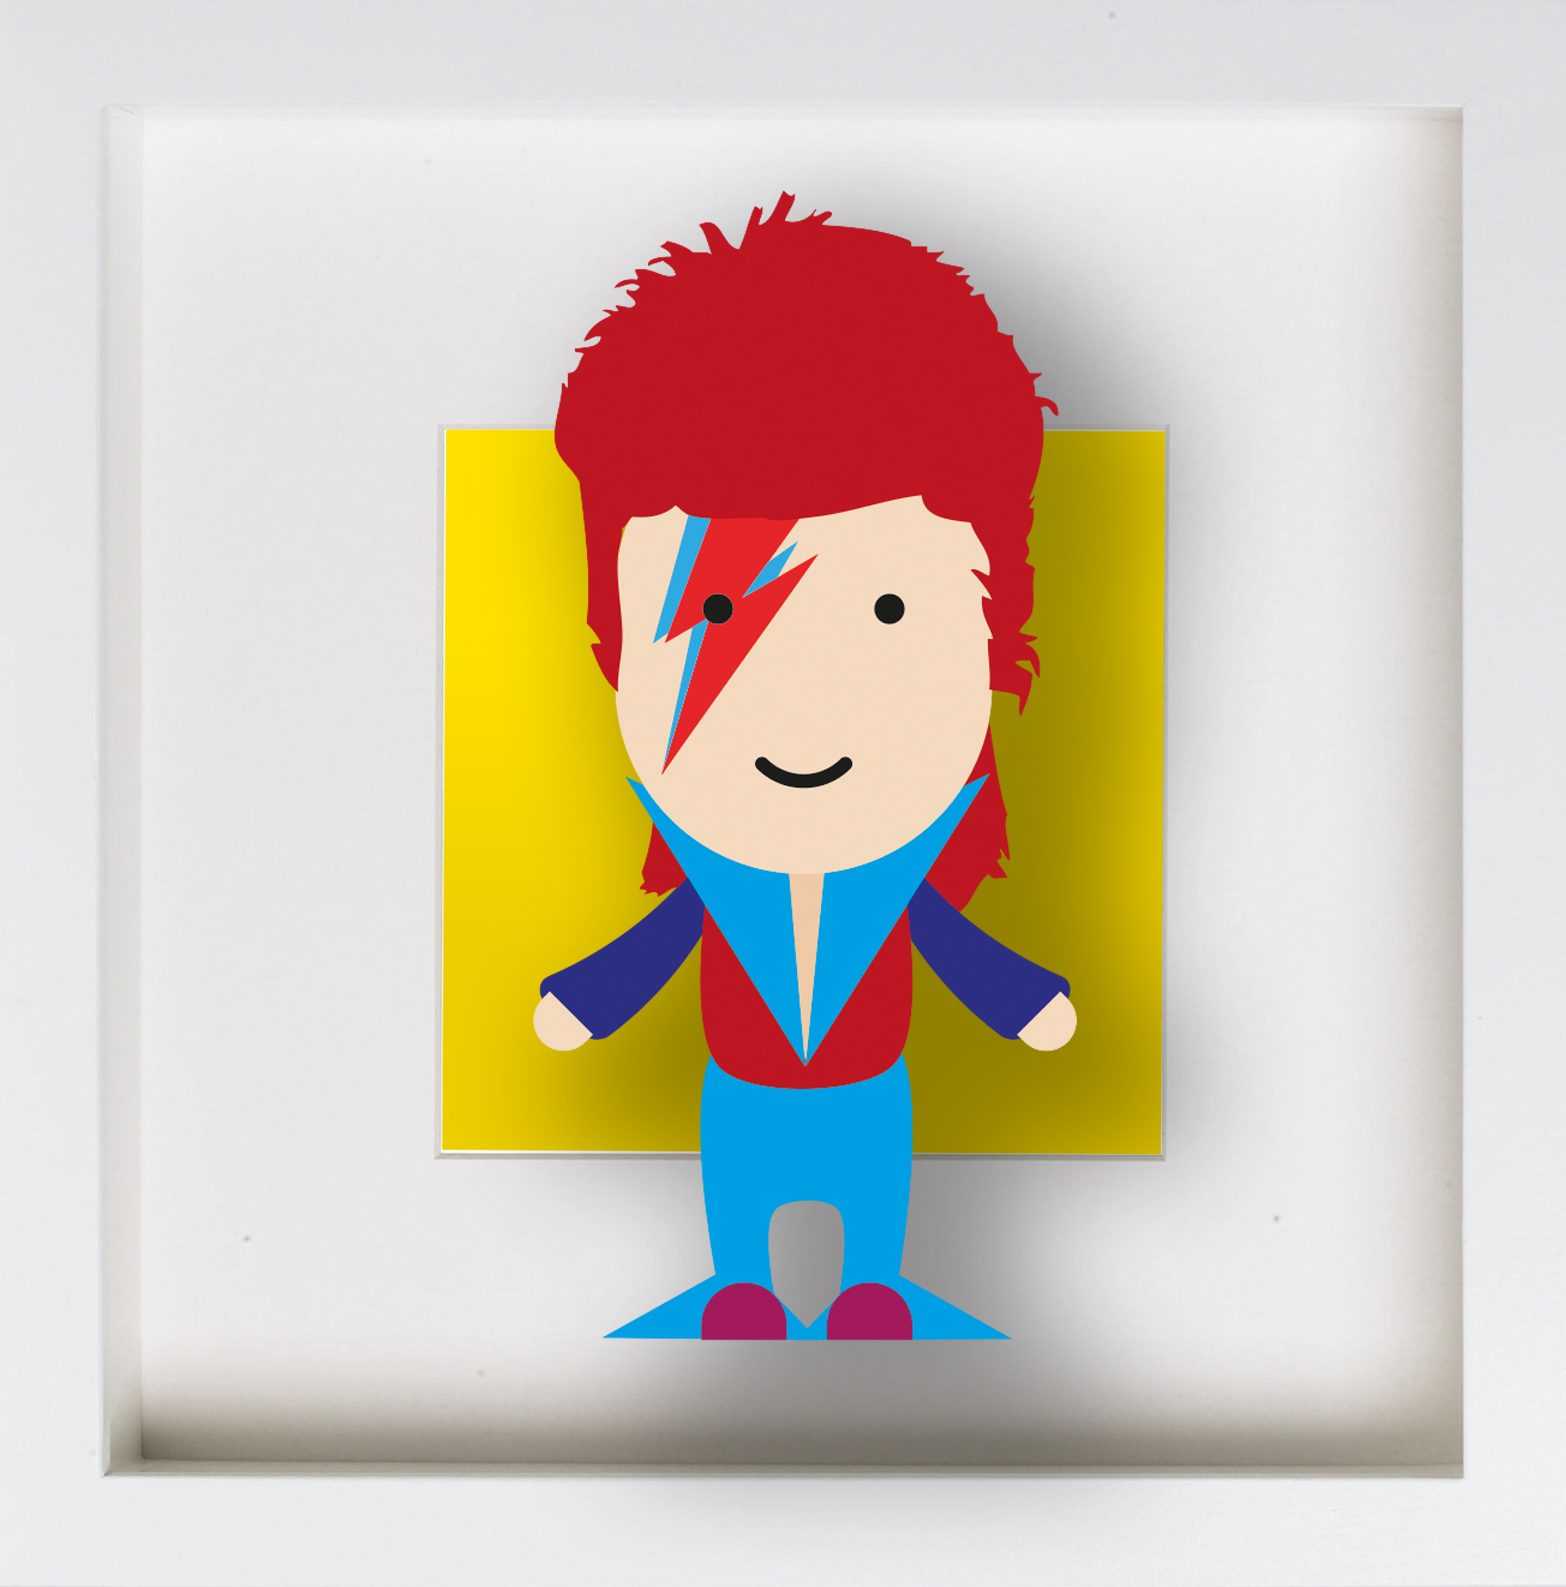 Dead Famous – Bowie – Fintan Wall Design Shop